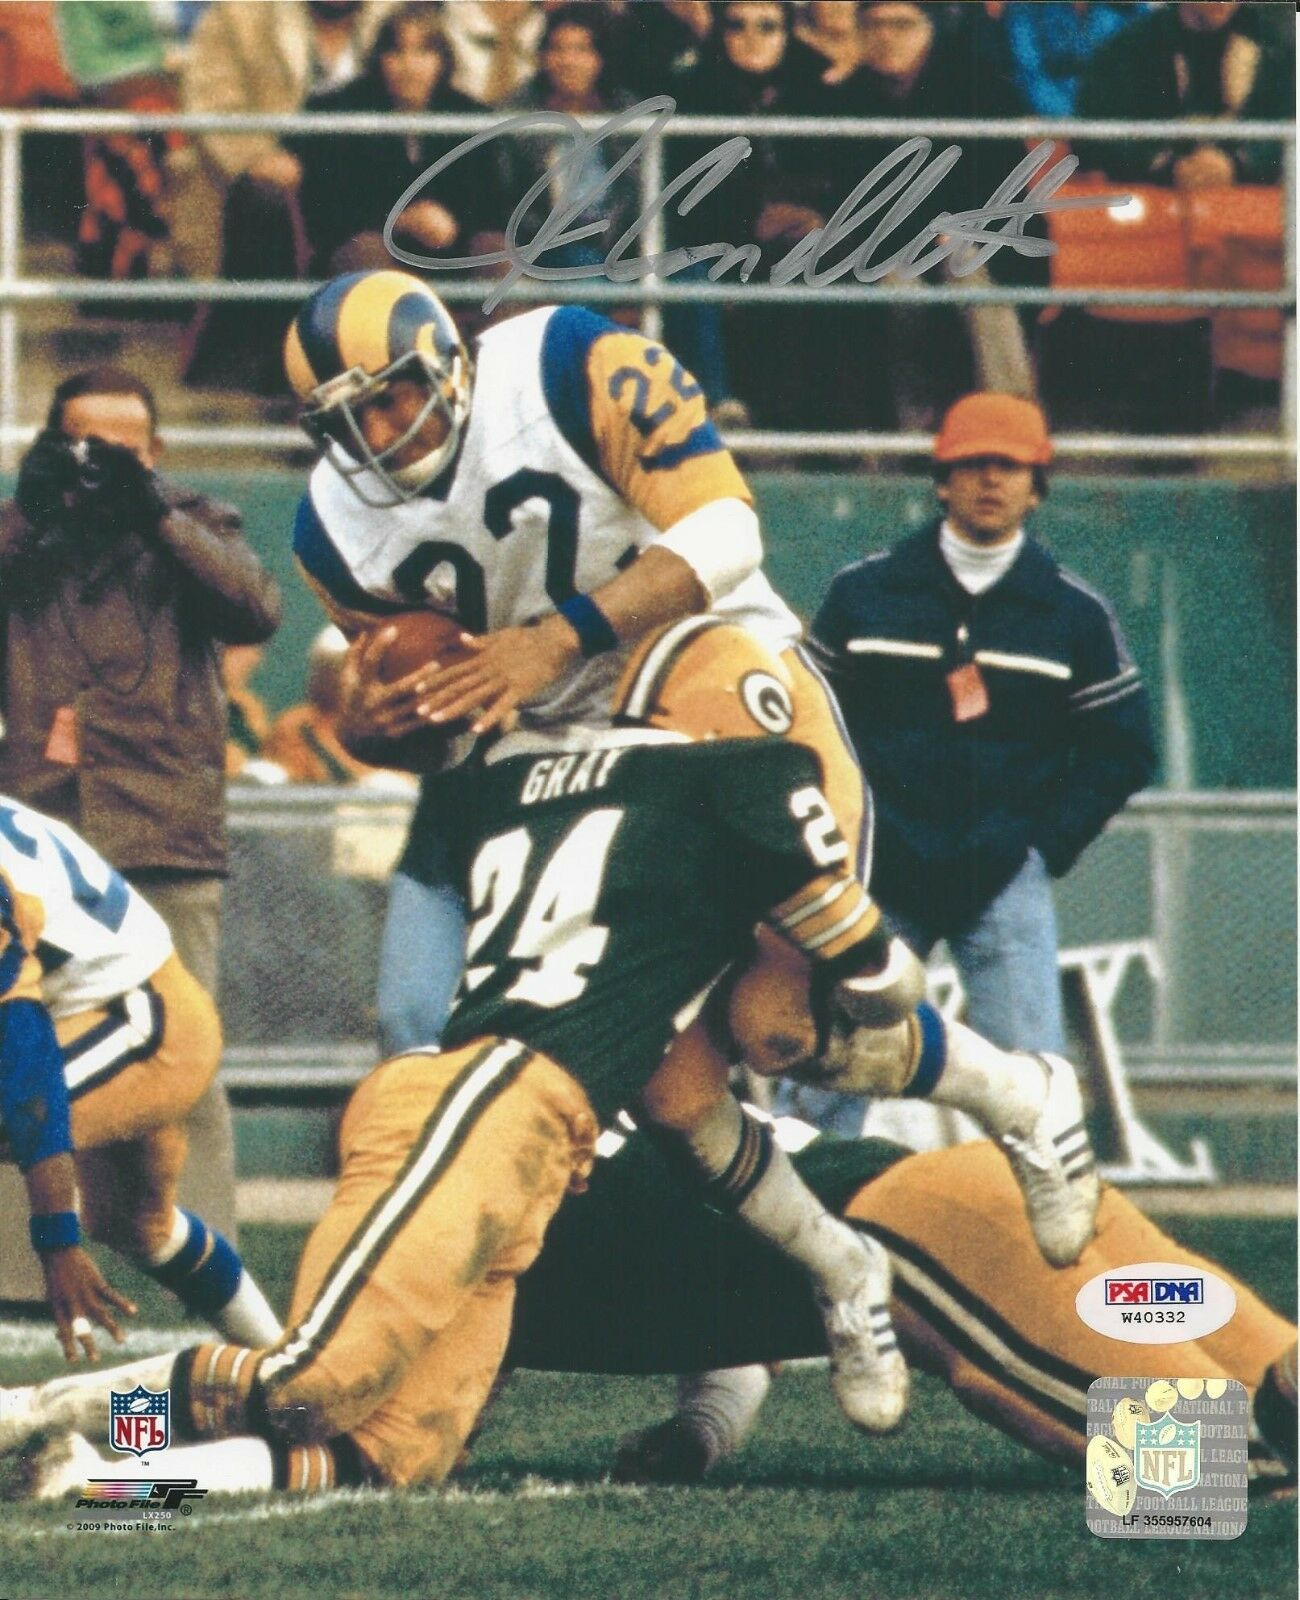 John Cappelletti Los Angeles Rams Signed 8x10 PSA/DNA # W40332